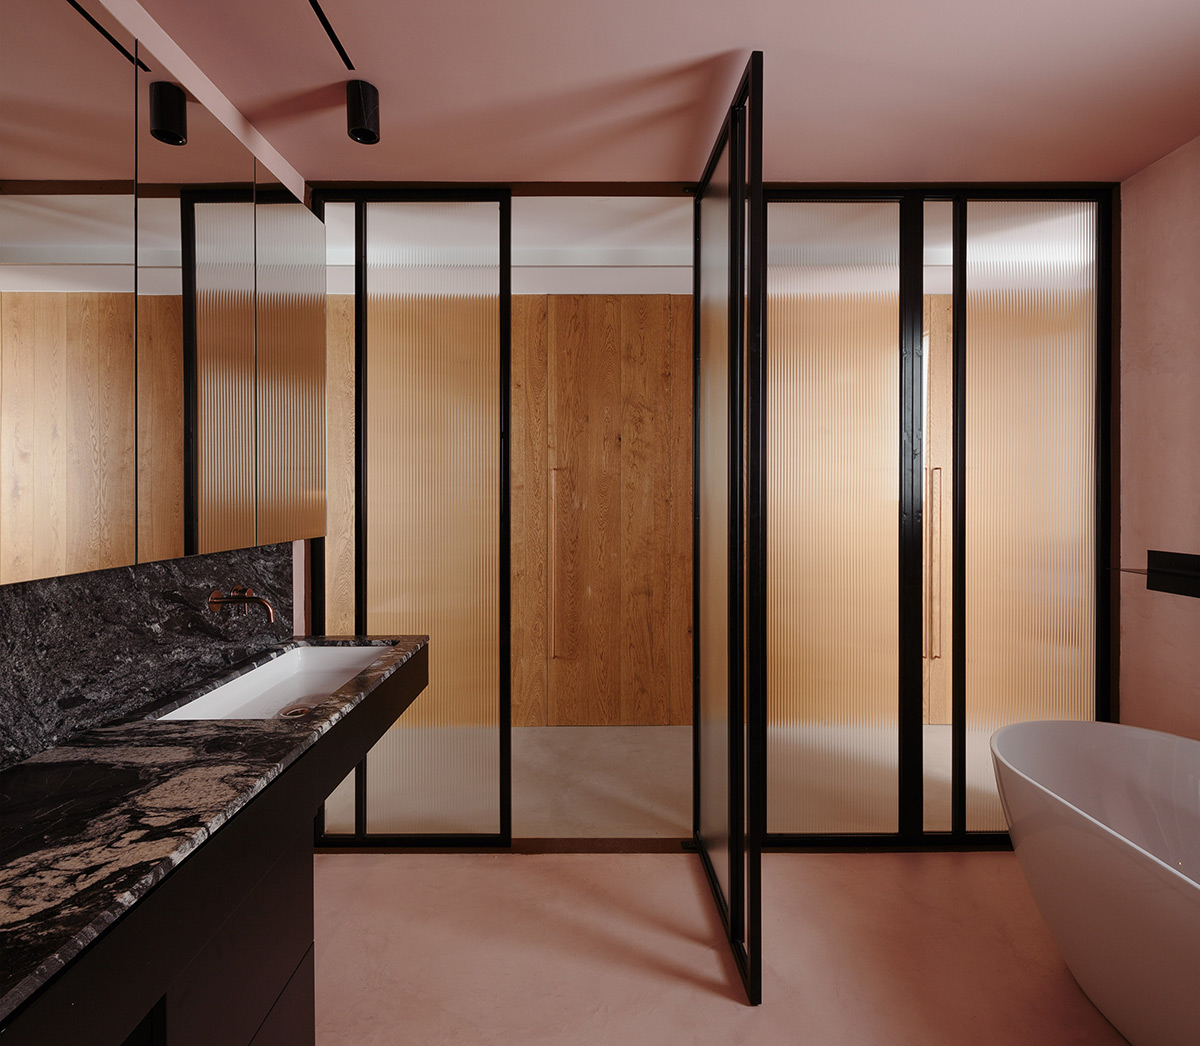 Atic-Aribau-Raul-Sanchez-Architects-David-Zarzoso-09